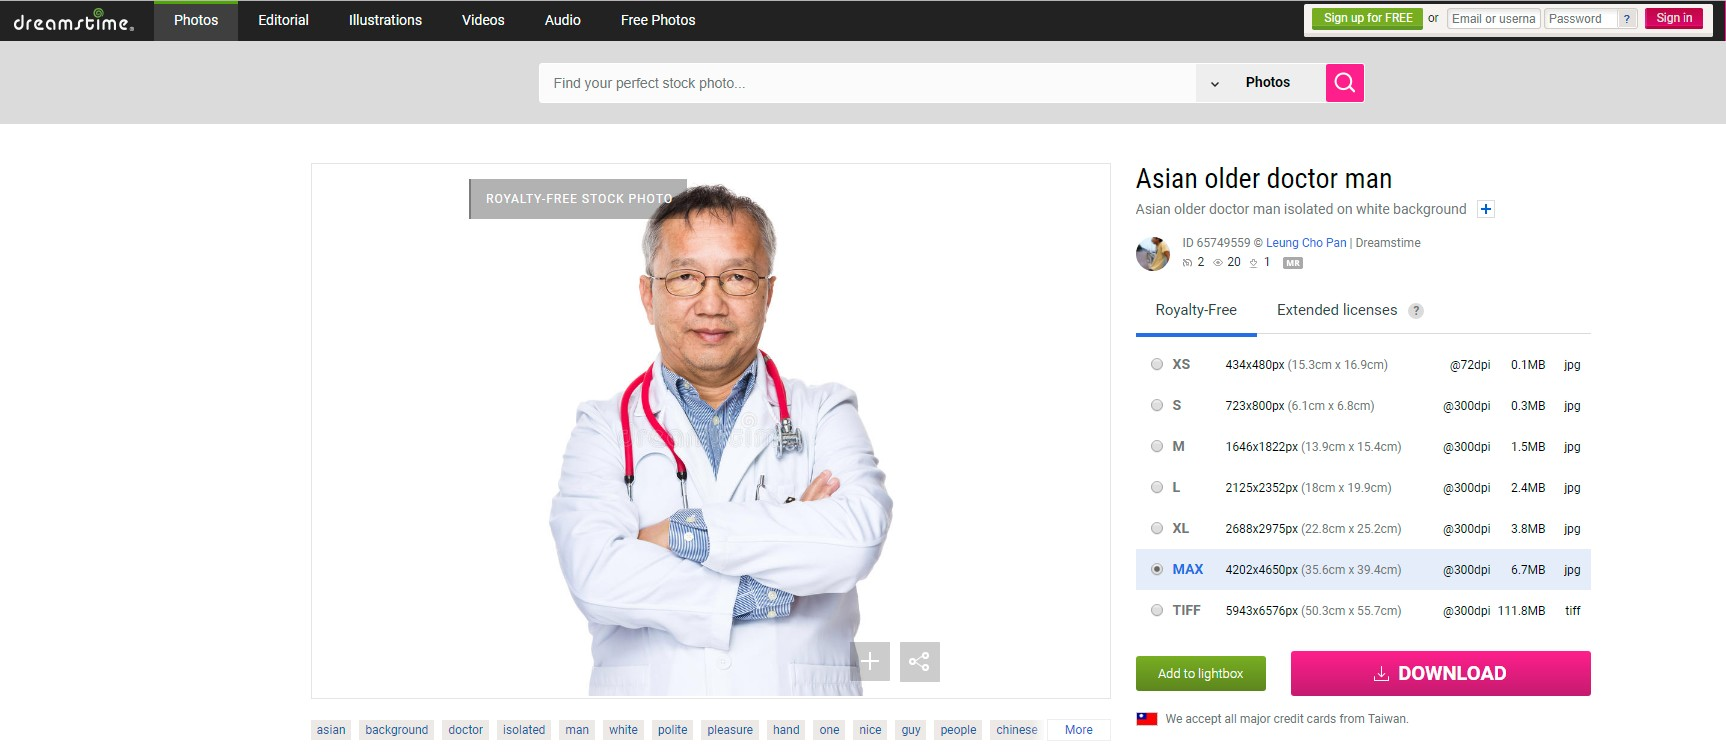 Asian Older Doctor Man Stock Photo - Image: 65749559